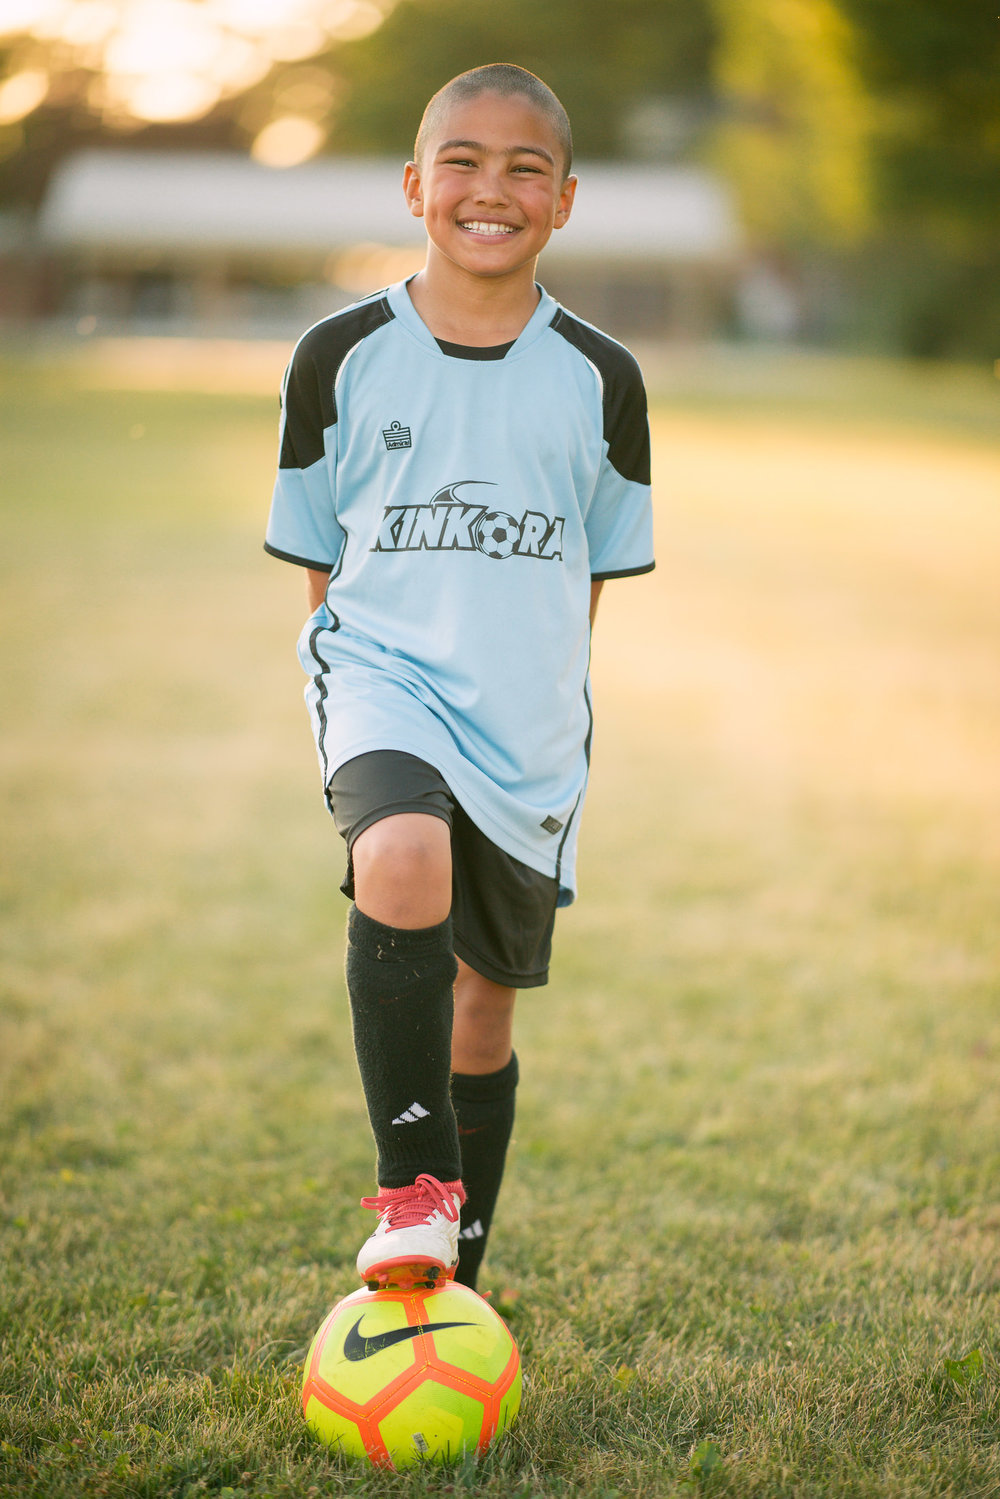 Kinkora-Soccer-Photos-046.jpg